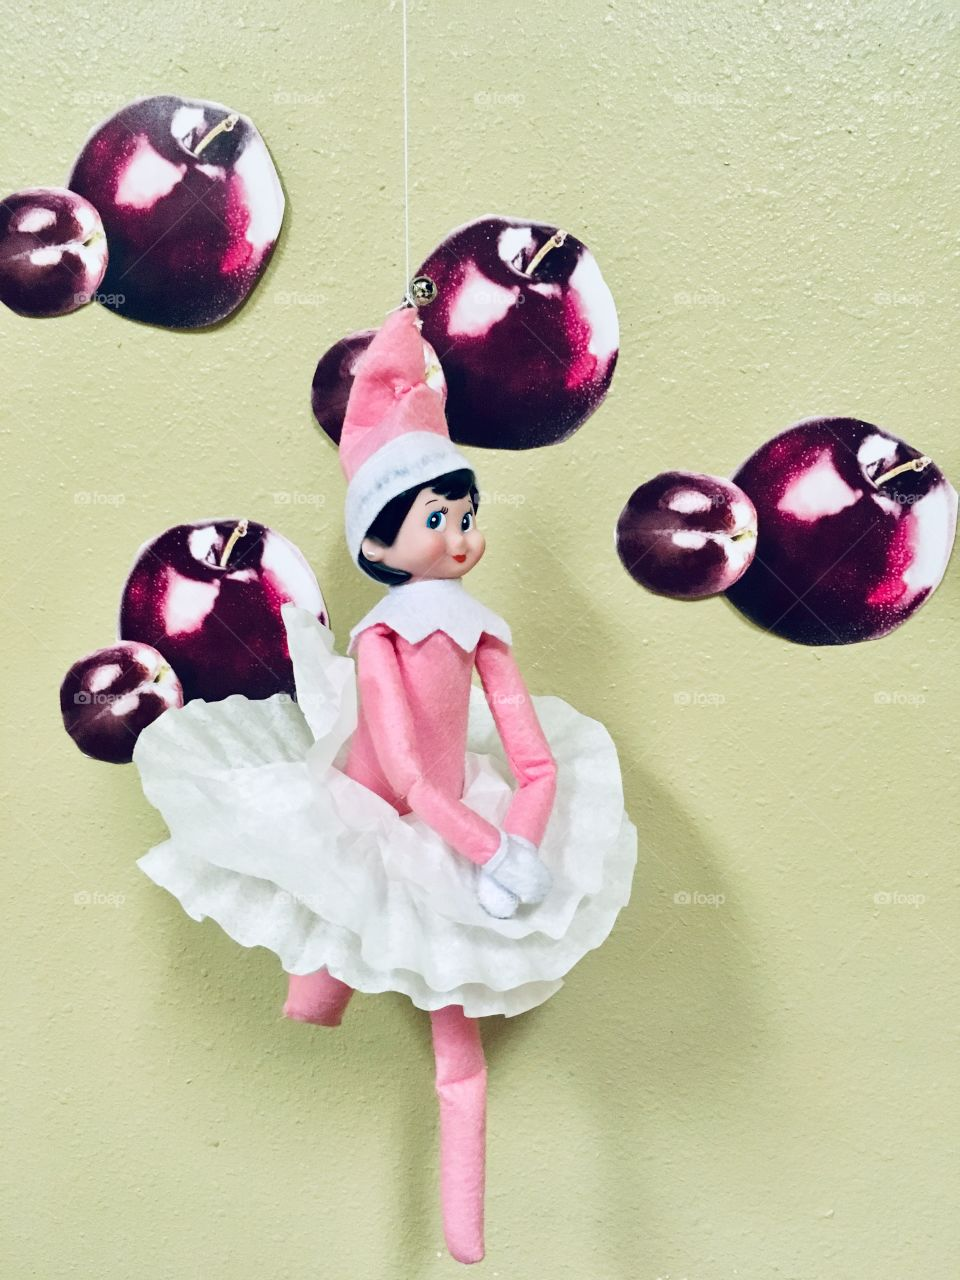 Naughty elf dancing like the Sugar Plum Fairy from the Nutcracker ballet